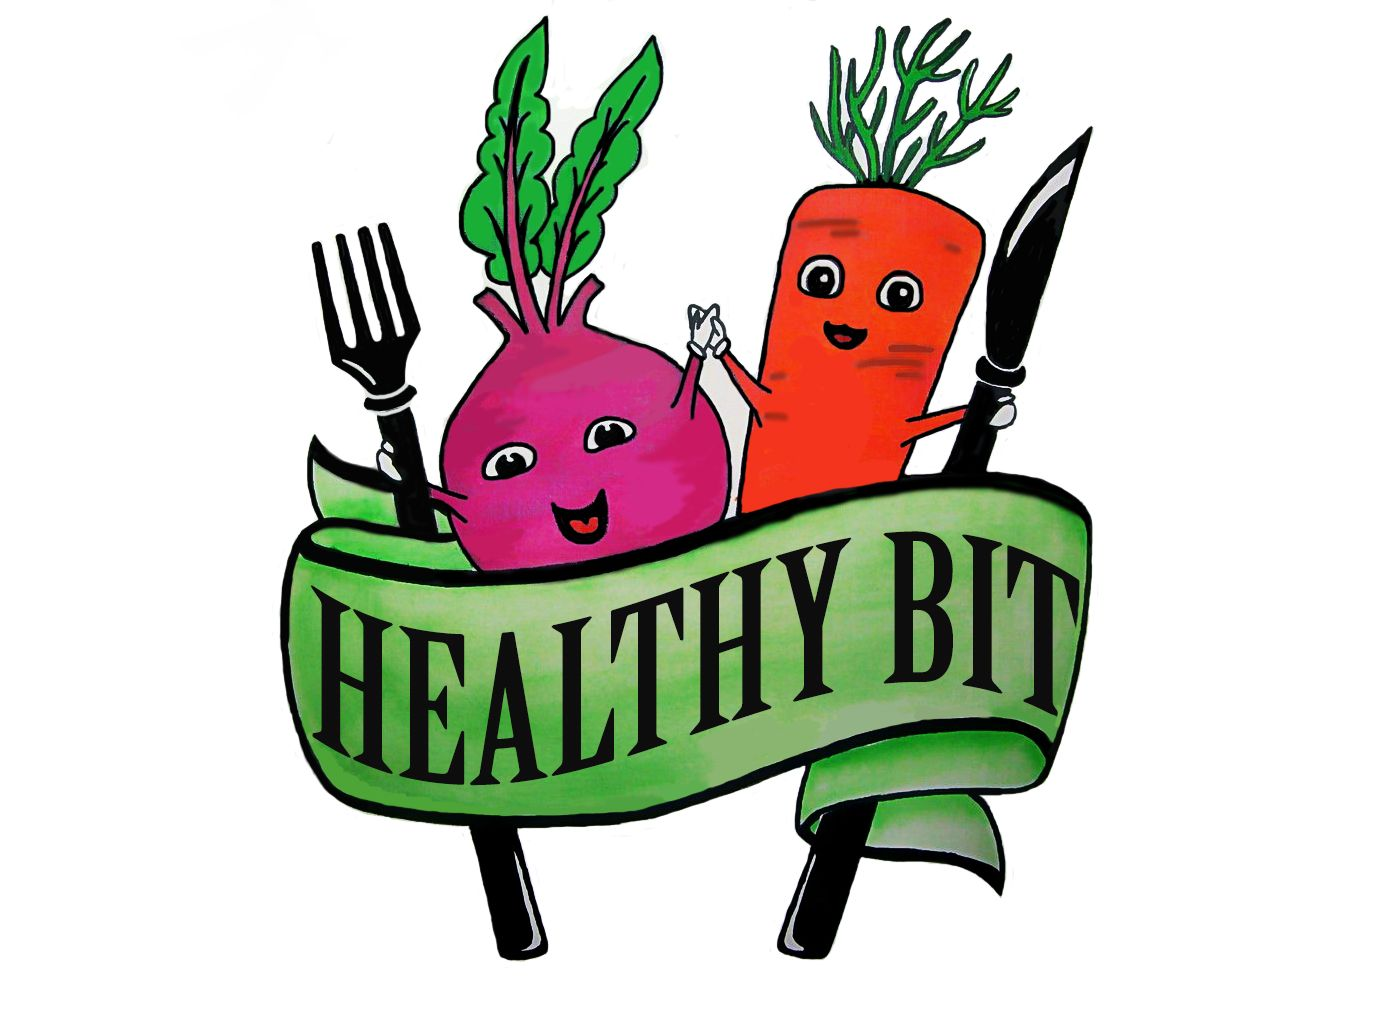 Healthy Bit или Healthy Beet - дизайнер KatrinAnzomi